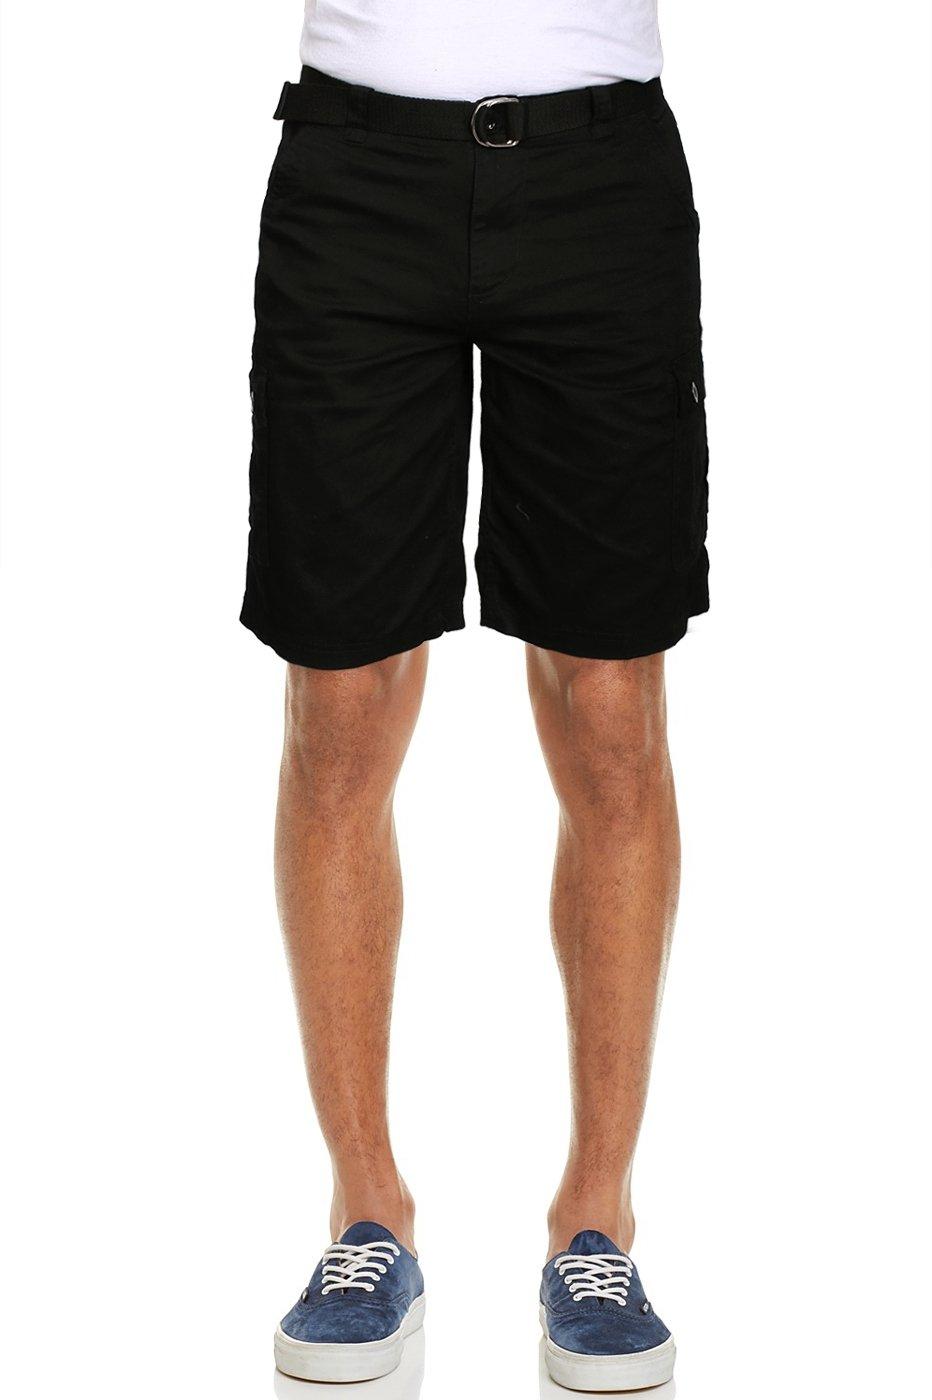 Zeta Wear Men's Solid Multi-Pocket Cotton Twill Pants Belted Cargo Shorts Black 32